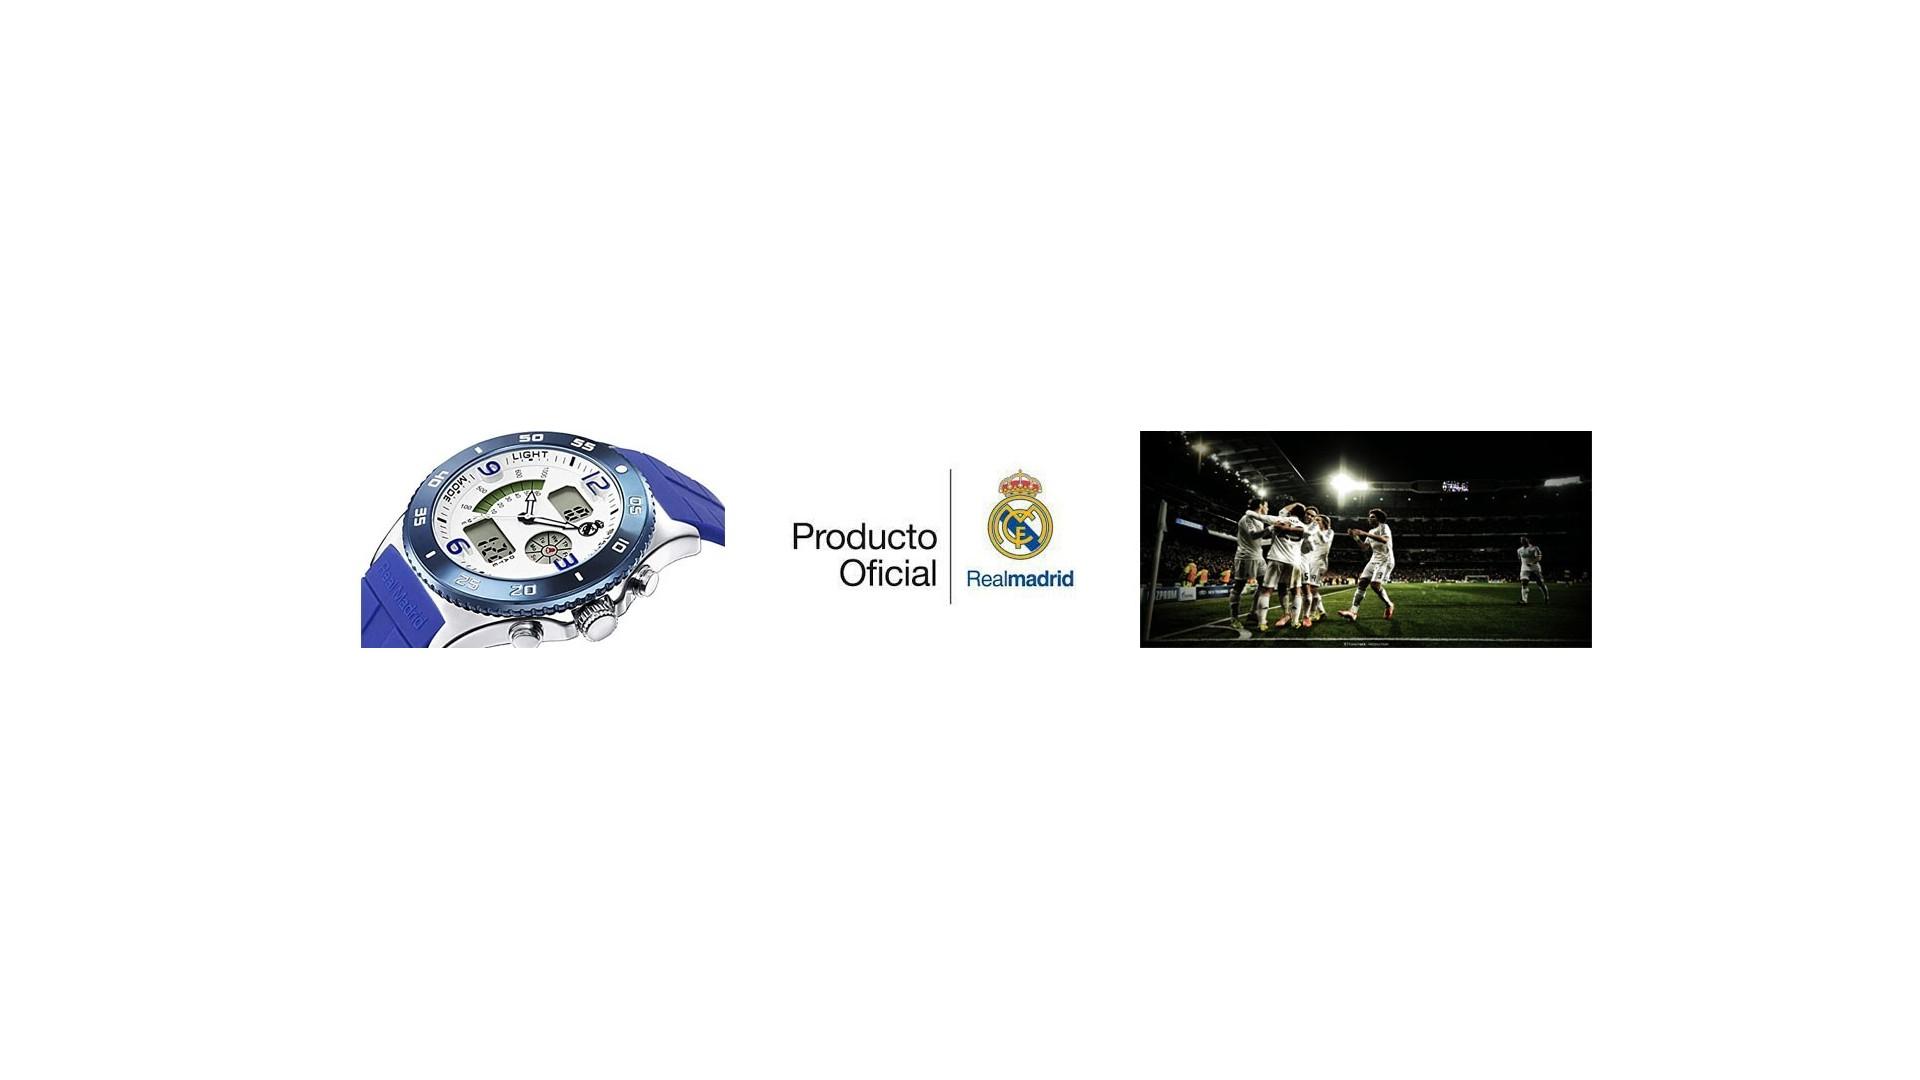 Relojes Real Madrid - Venta online